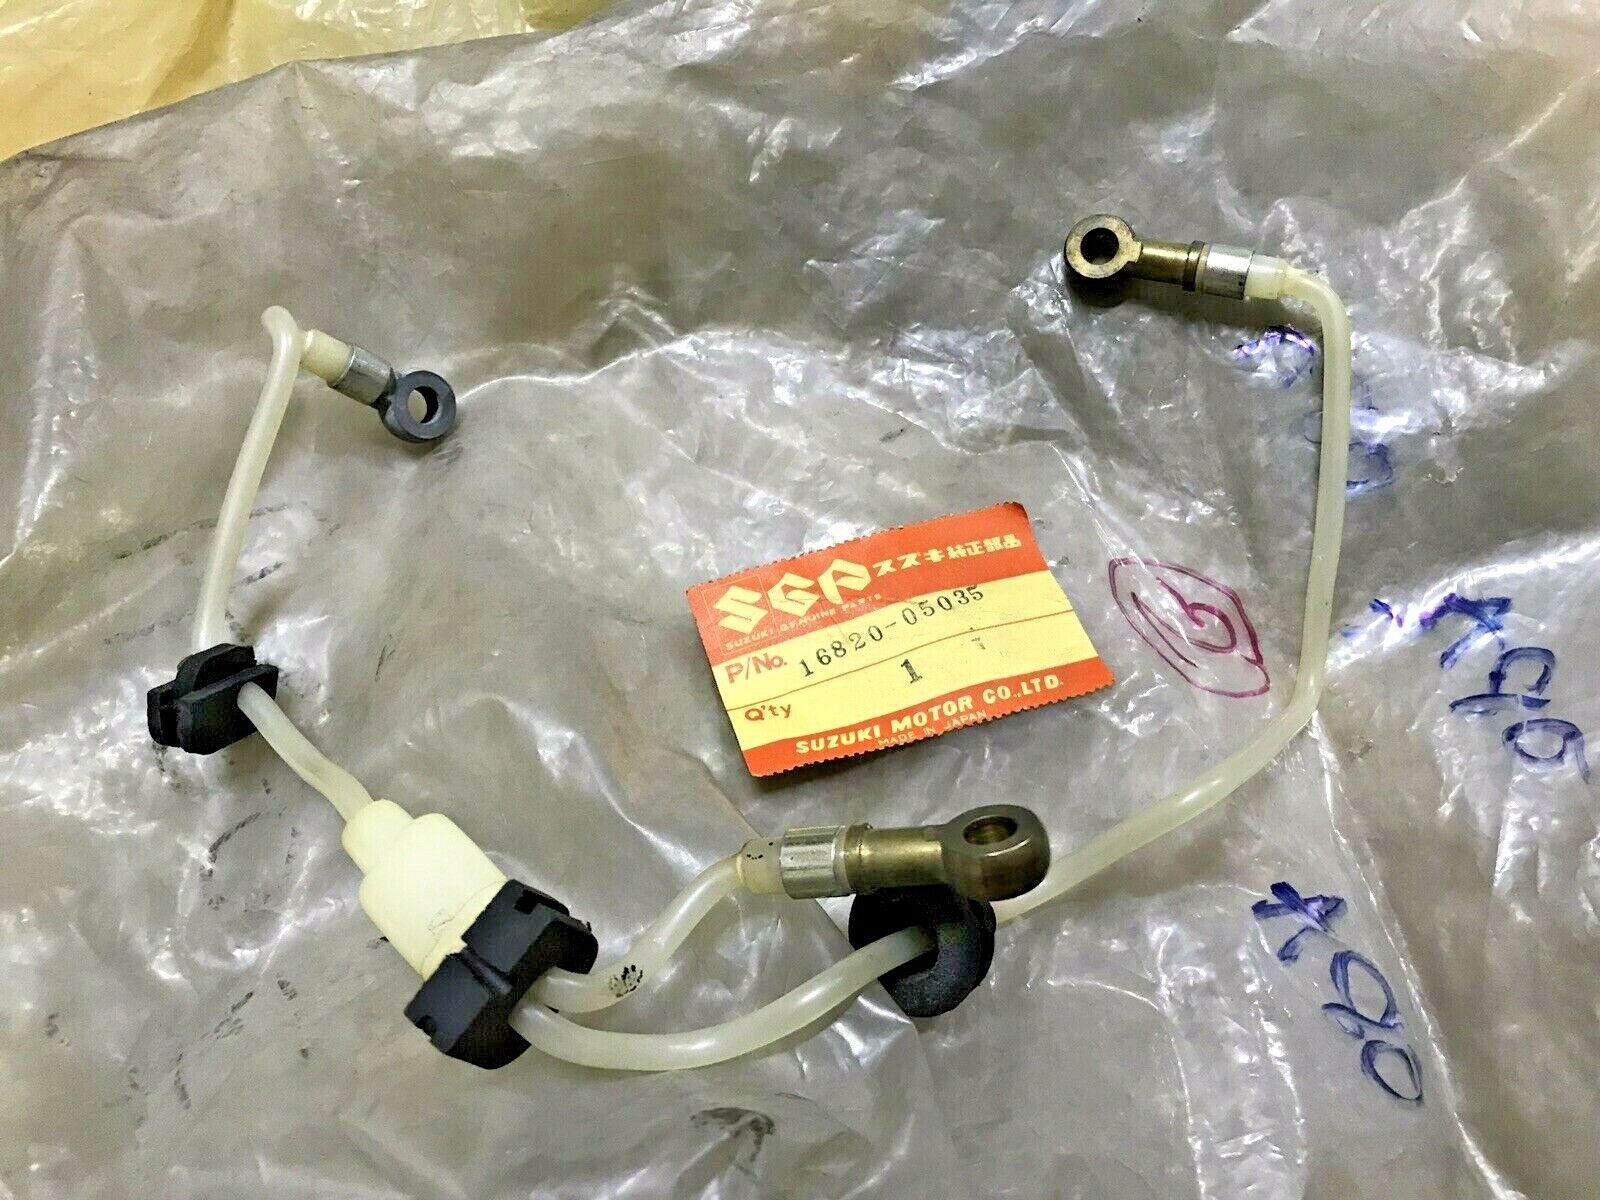 Details about  /Suzuki A50 AC50 AS50 A70 A80 Oil Hose Line Outlet No.2 NOS Genuine 16820-05035